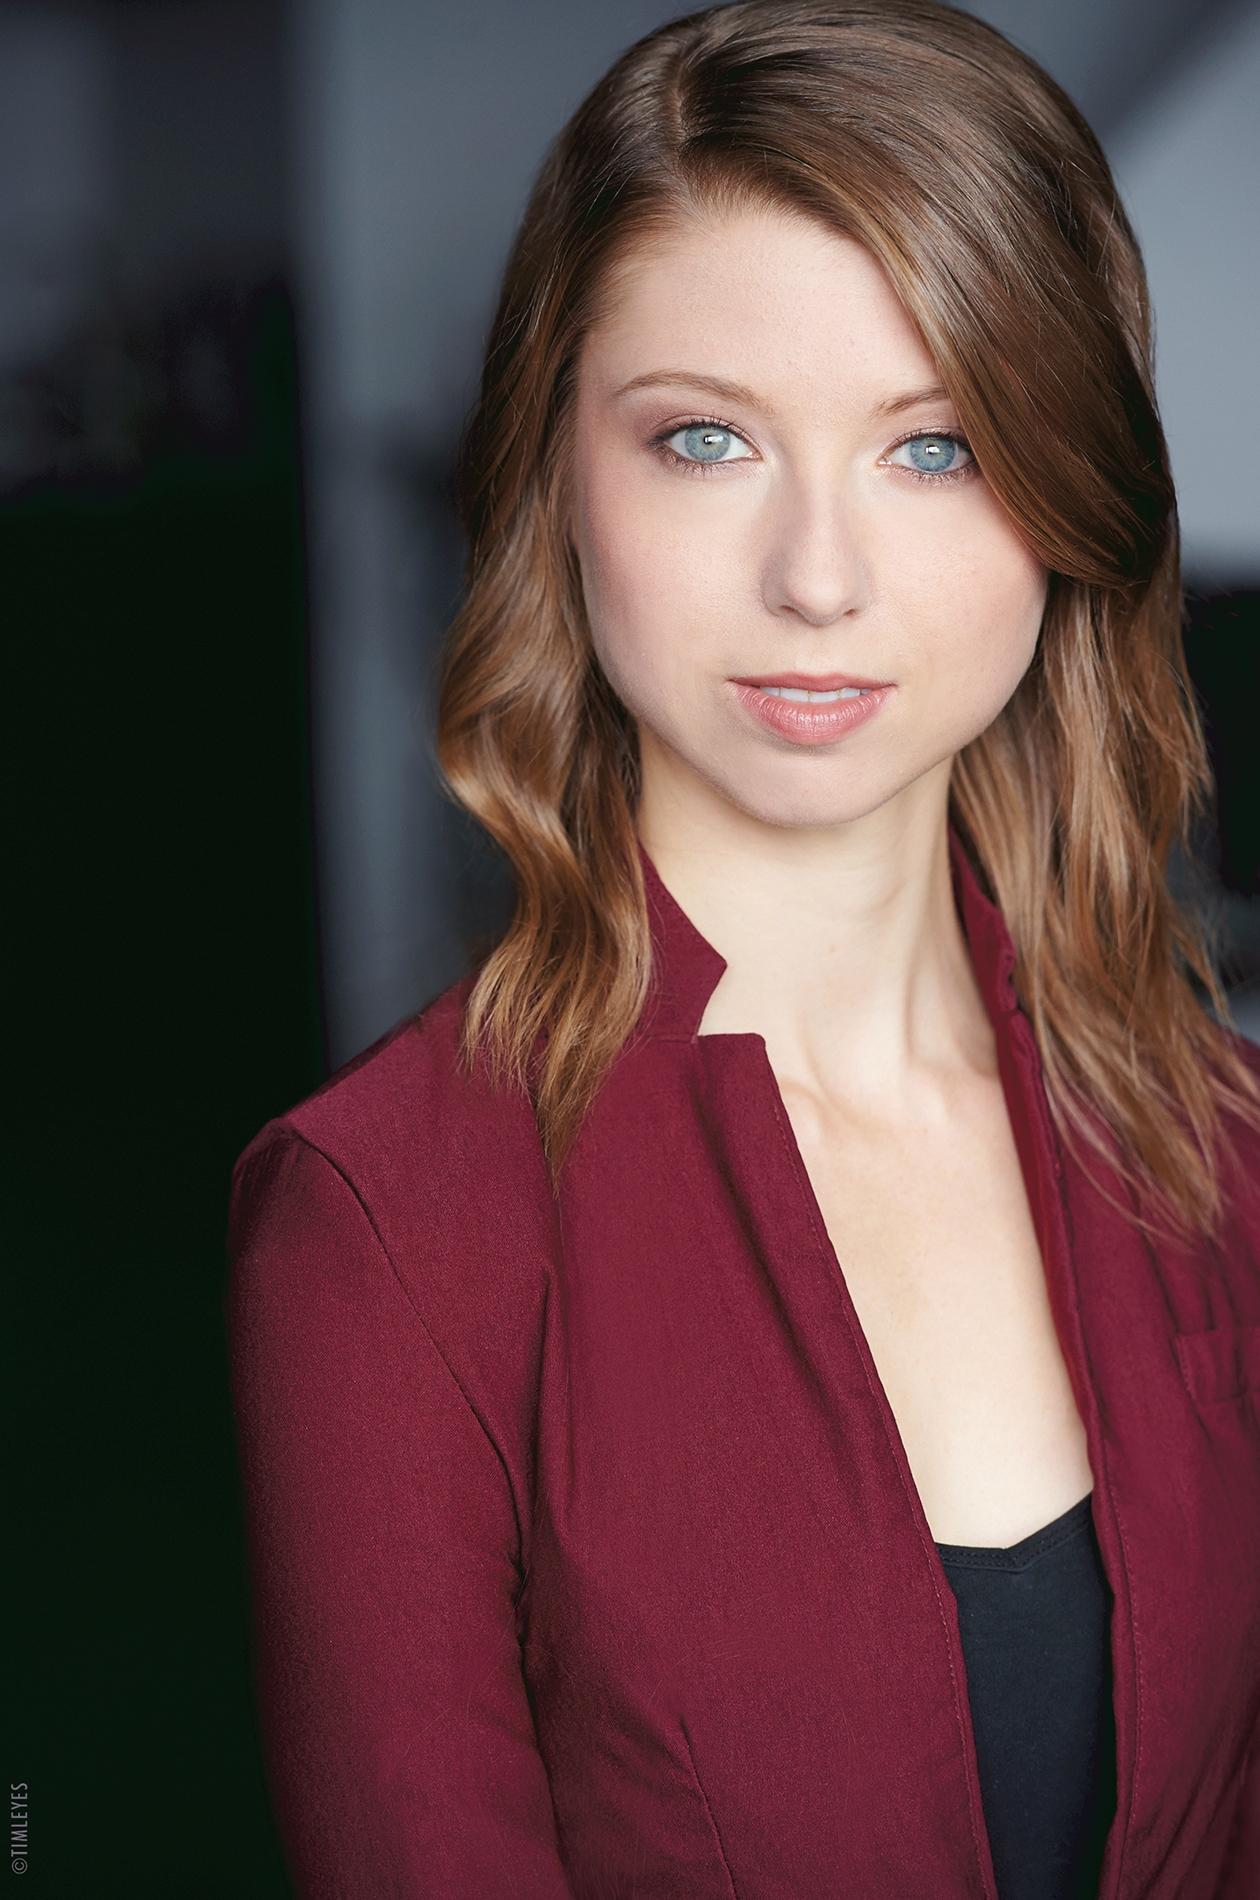 Cora Matheson